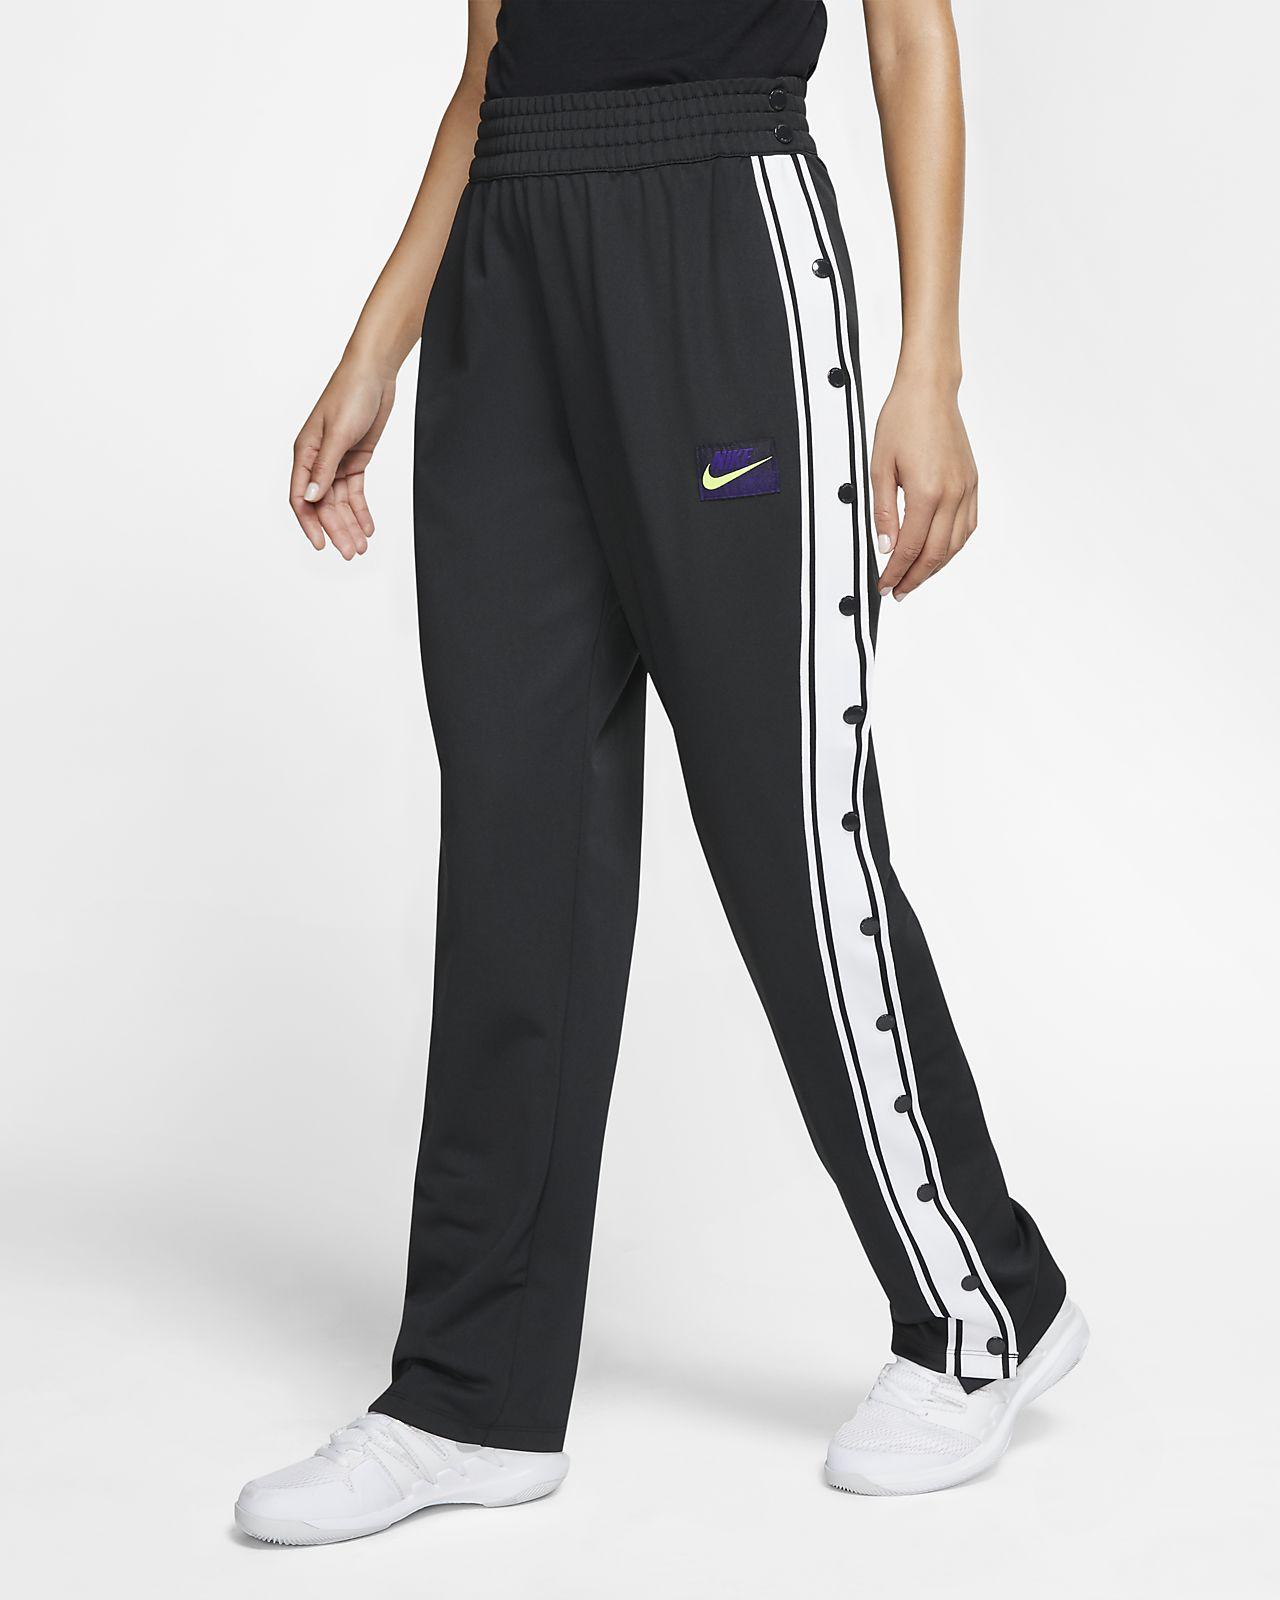 NikeCourt Pantalón de tenis - Mujer